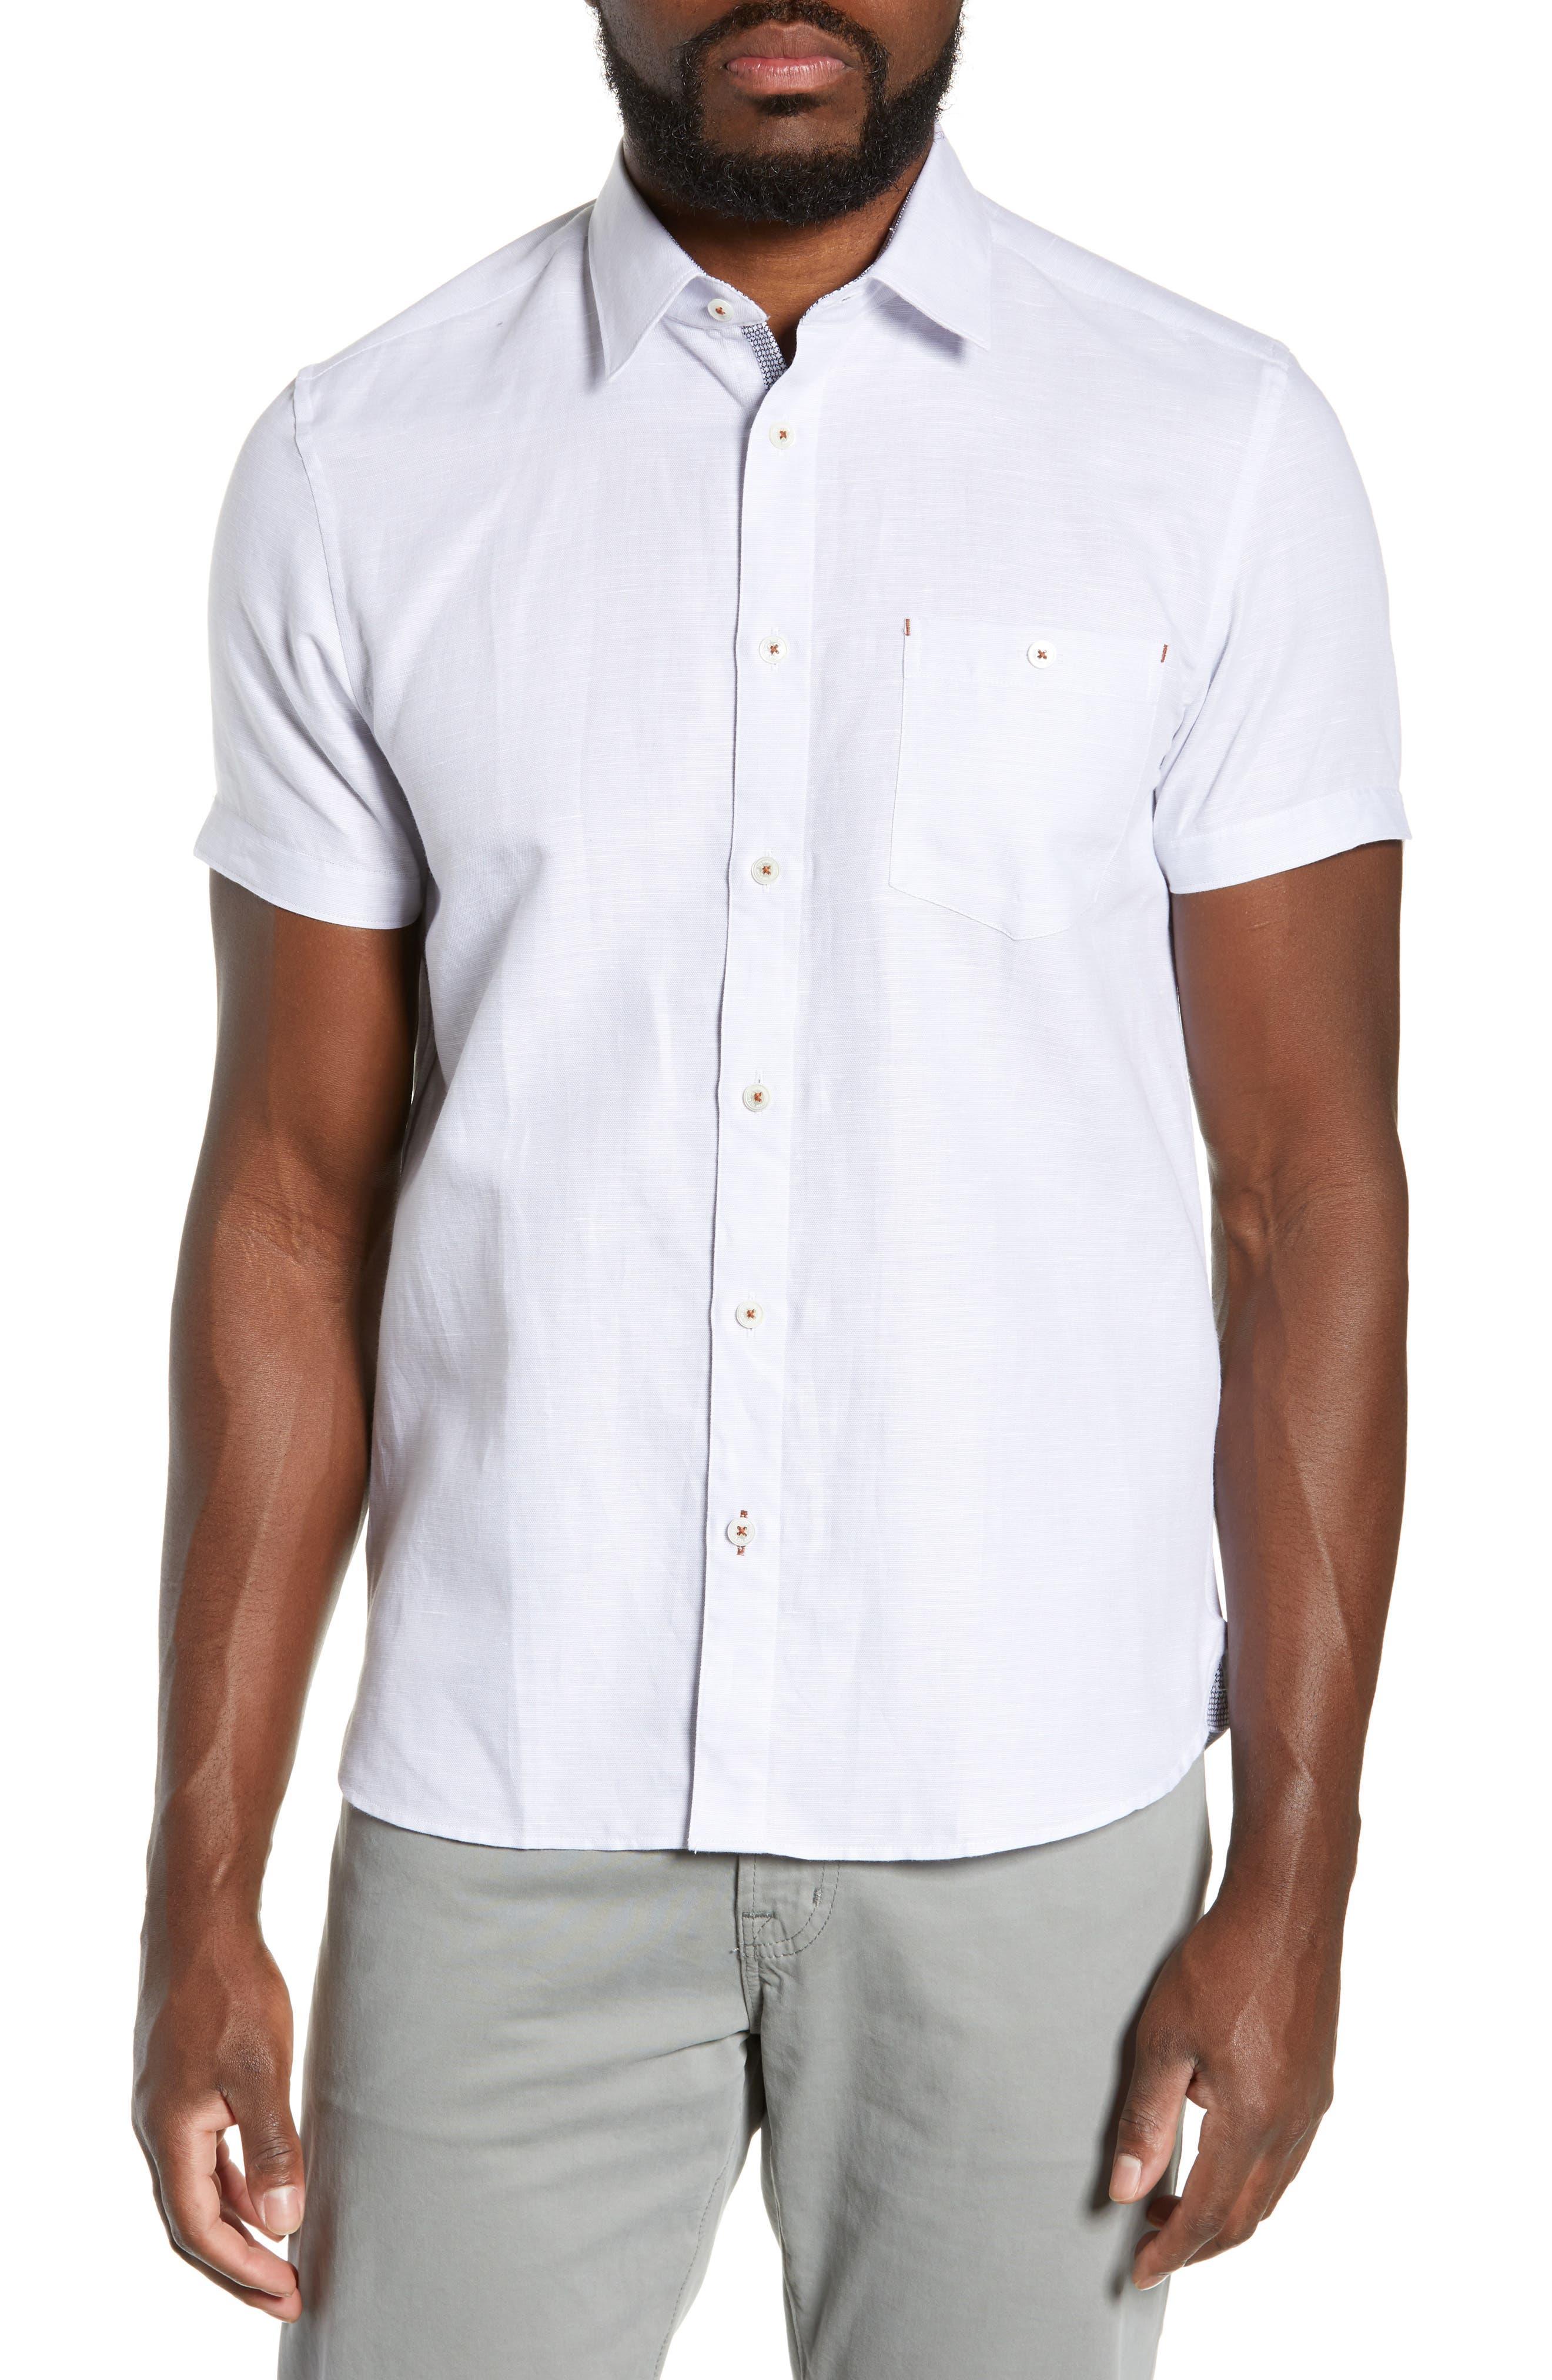 TED BAKER LONDON Graphit Slim Fit Cotton & Linen Sport Shirt, Main, color, GREY